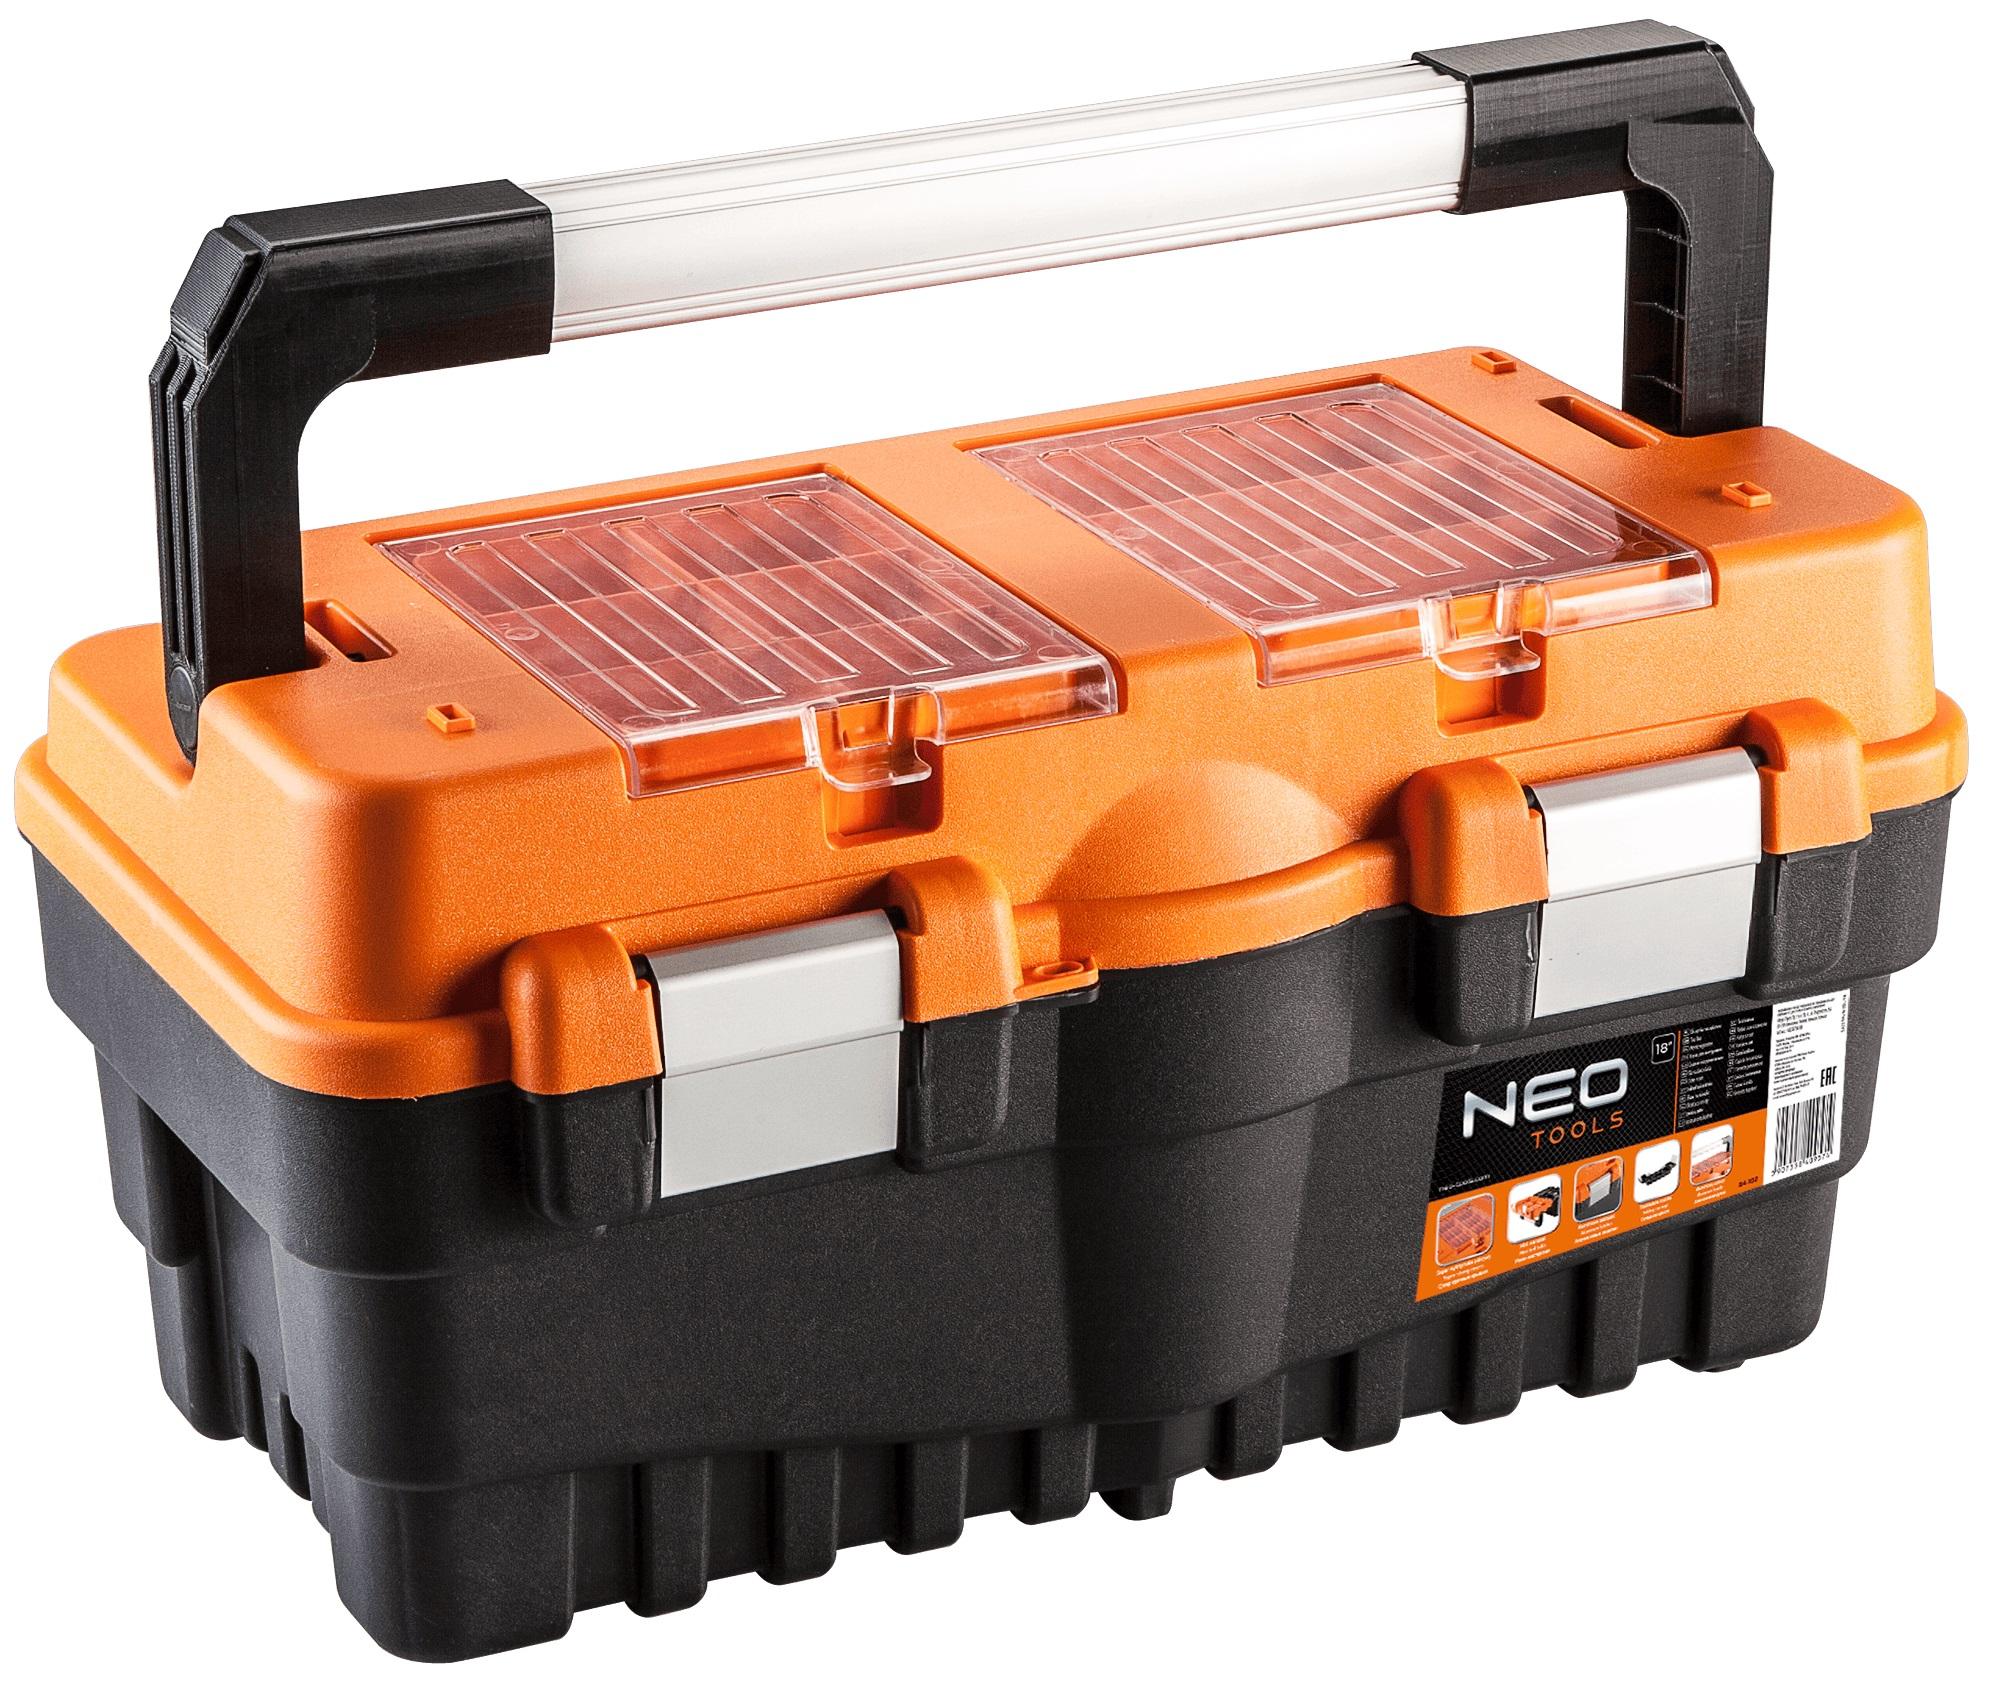 Neo Tools 84-102 Ящик для iнструменту 16